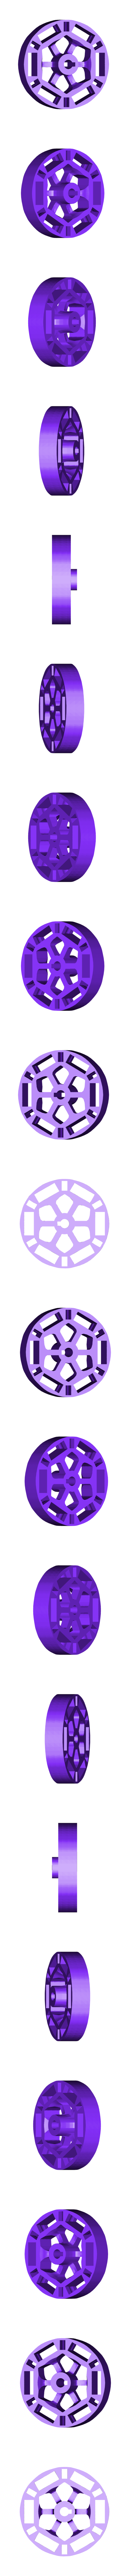 Flywheel.STL Download free STL file Working Oscillating Steam Engine MKI • Object to 3D print, billythemighty3Dprinter